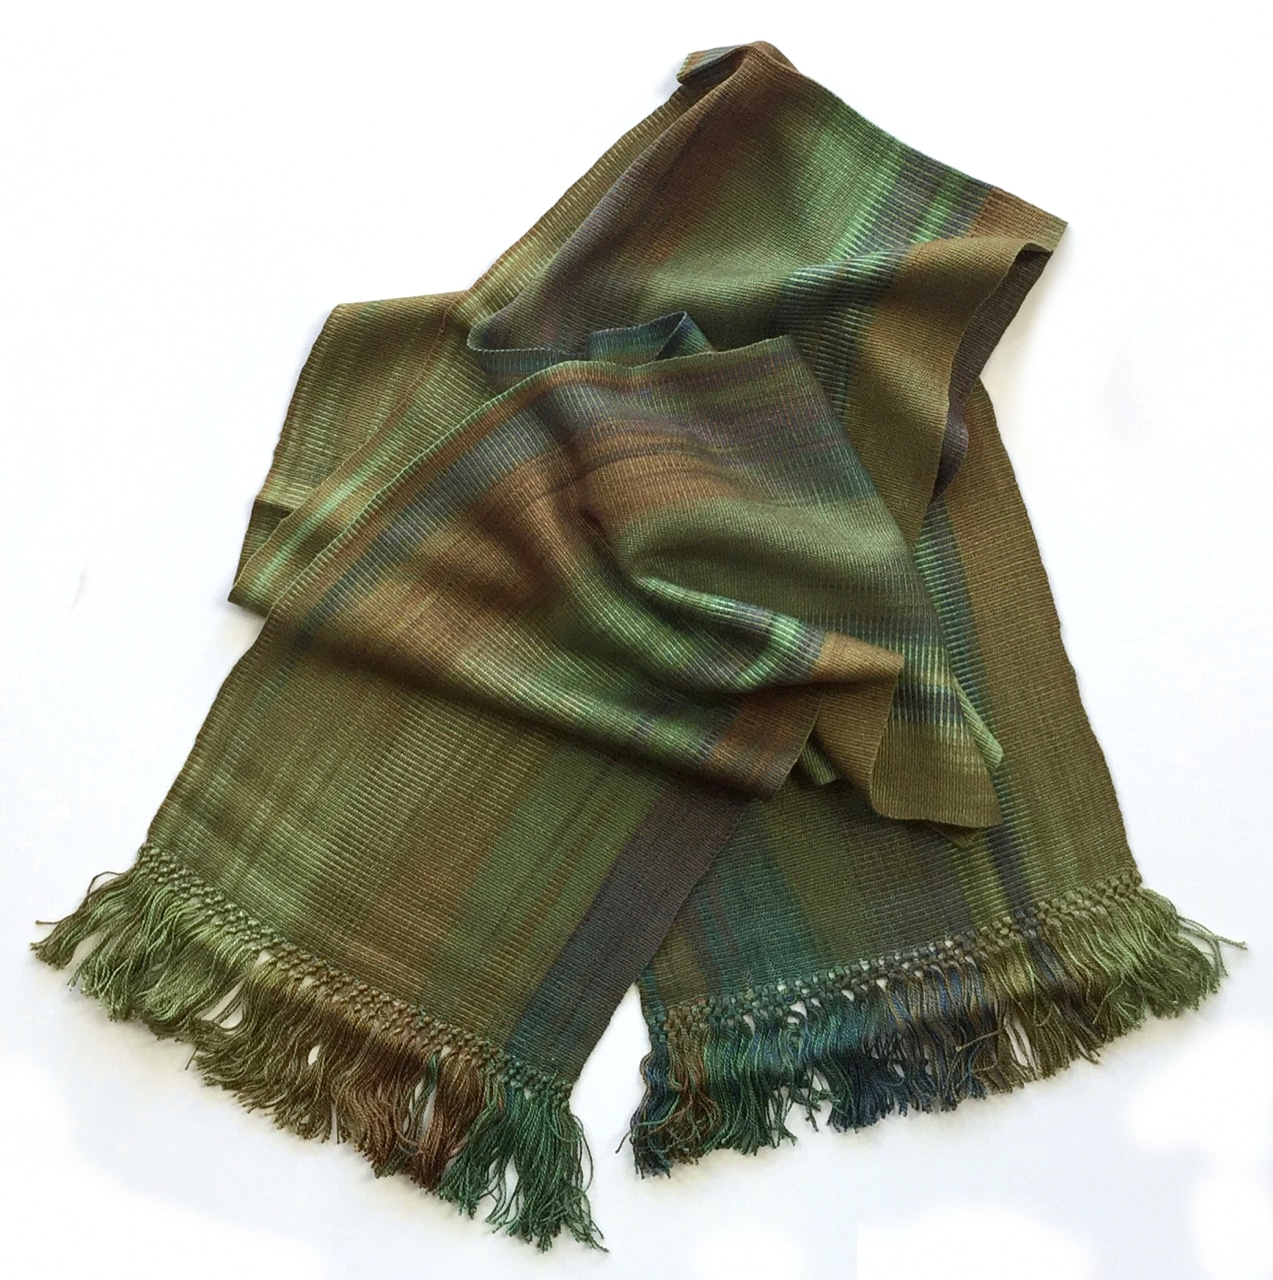 Greens, Brown, Copper - Lightweight Bamboo Handwoven Scarf 8 x 68